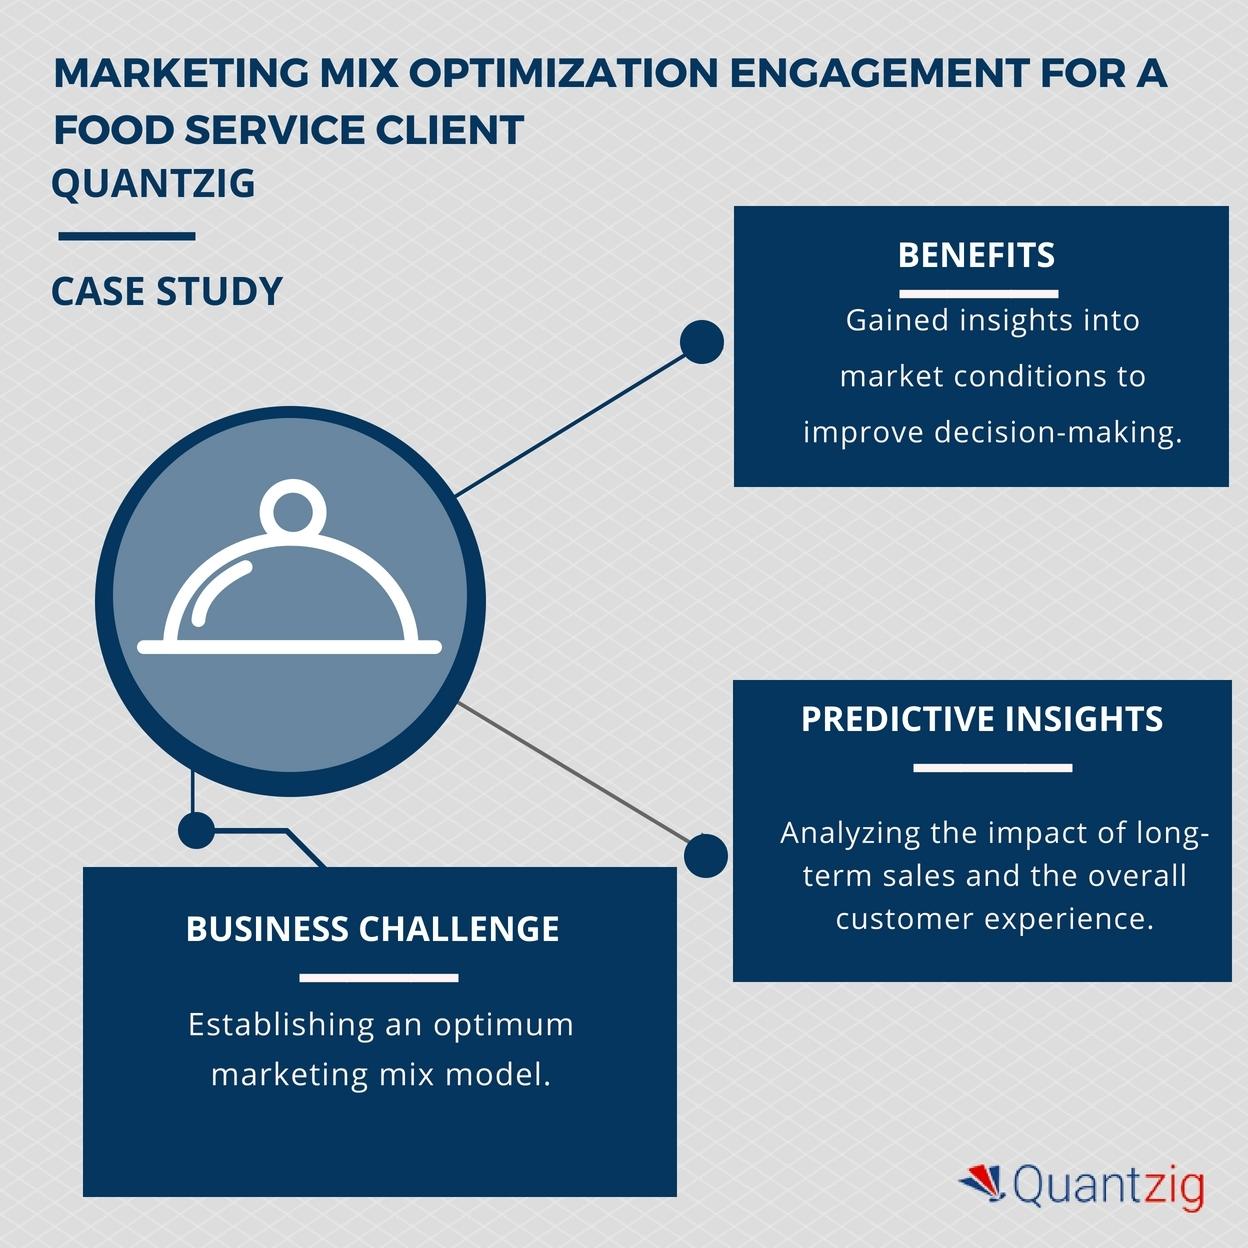 Quantzig\'s Marketing Mix Optimization Engagement Helped a Food ...